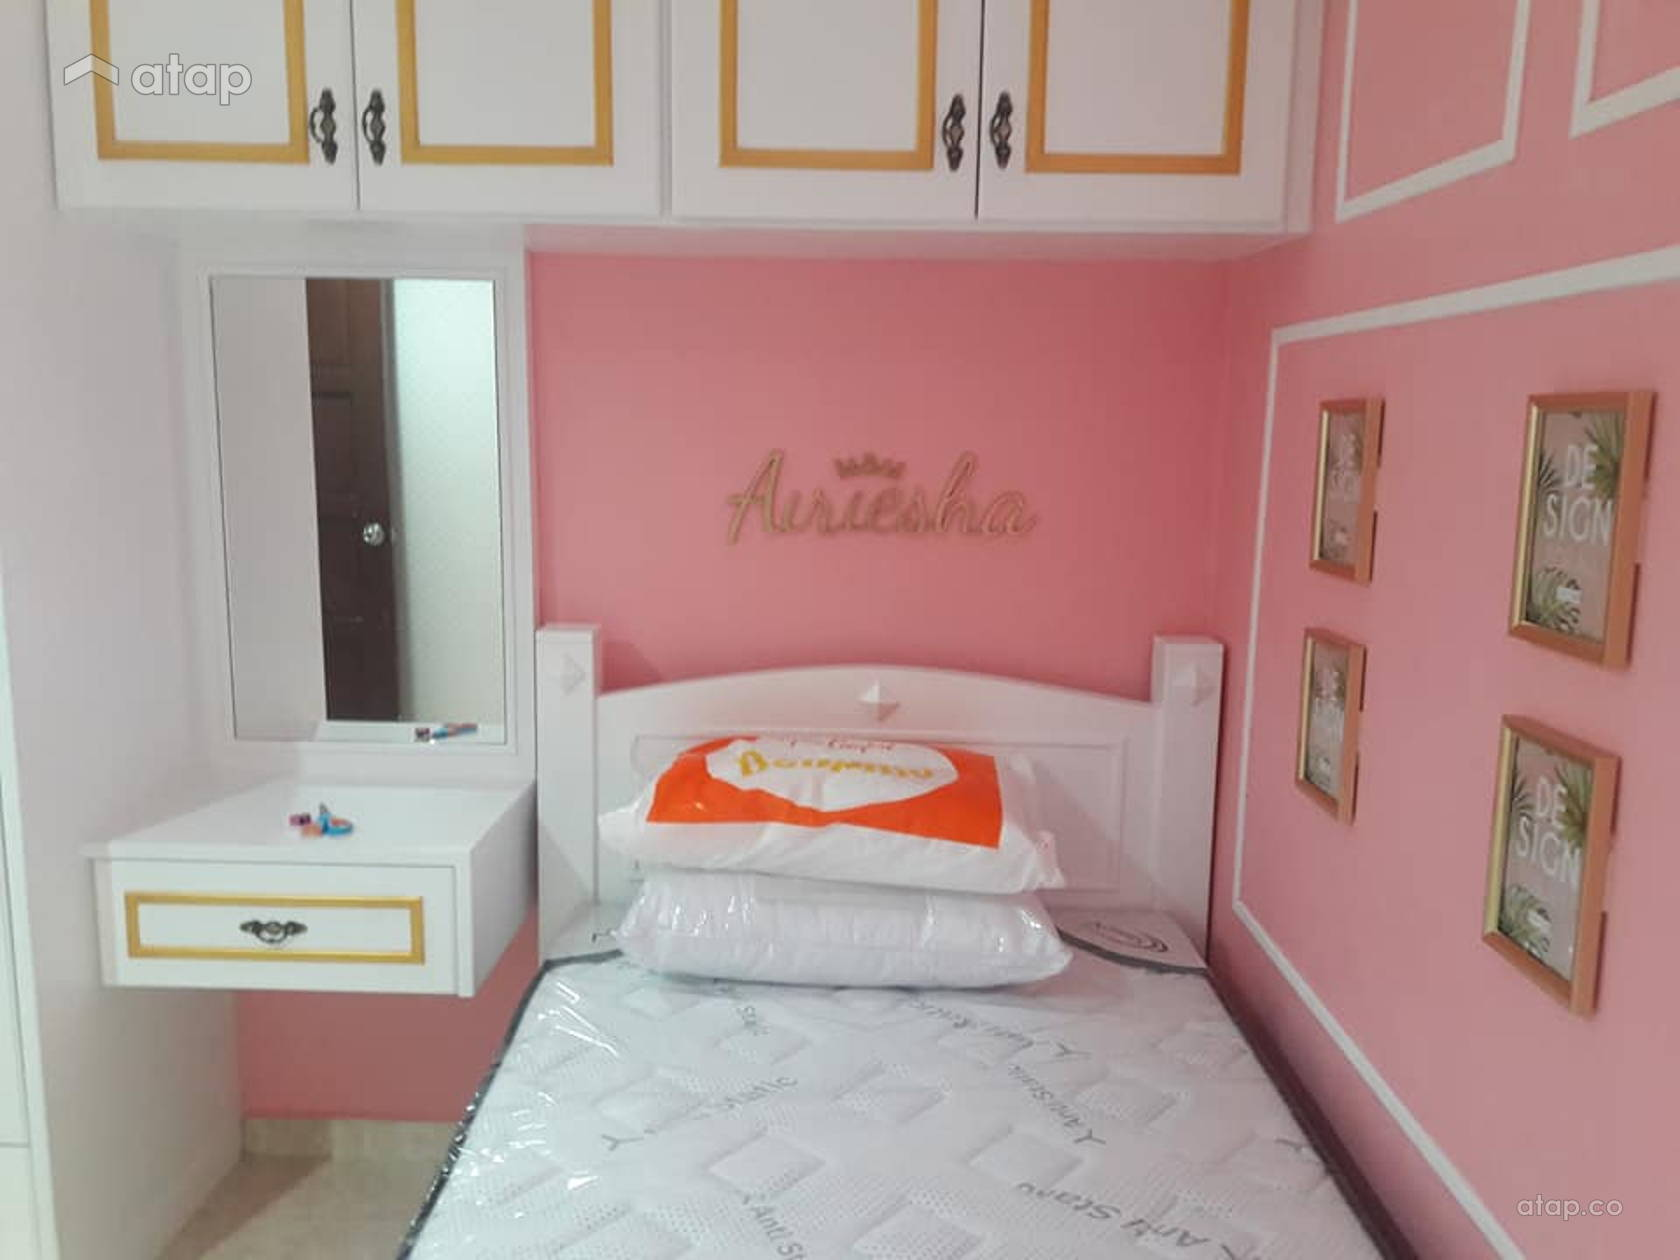 Princess Daughter Room Interior Design Renovation Ideas Photos And Price In Malaysia Atap Co